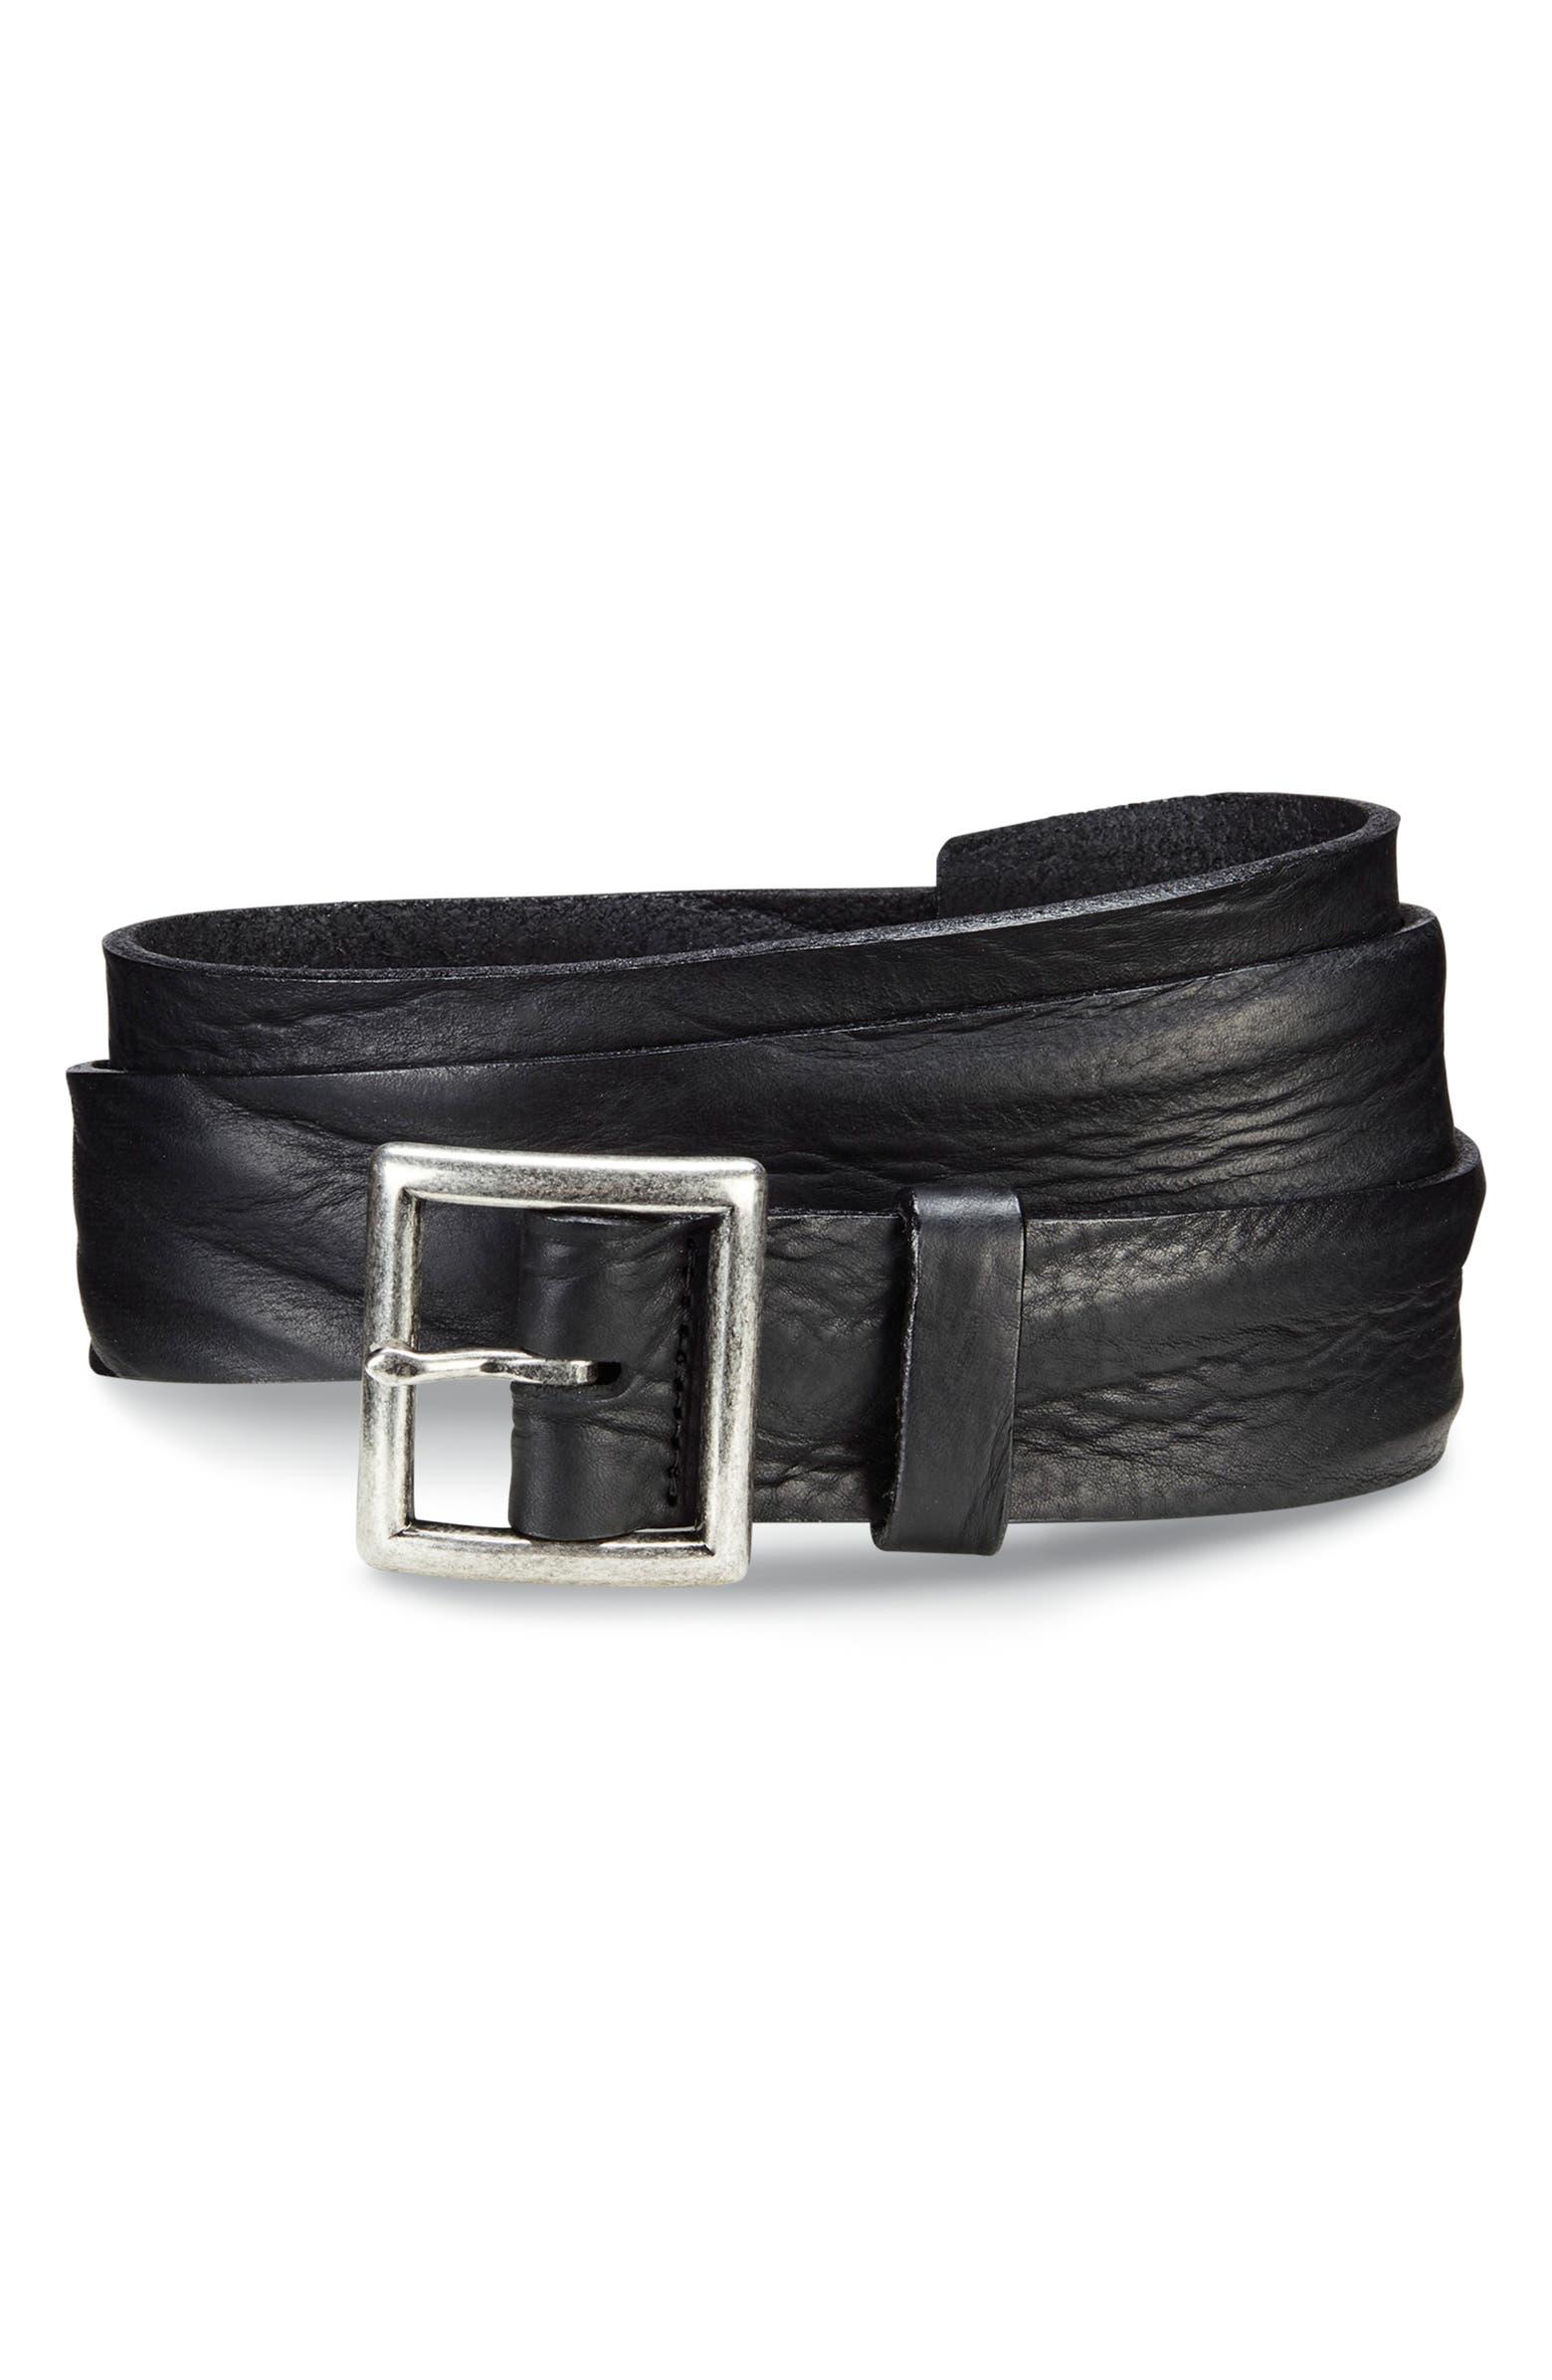 Radcliff Avenue Leather Belt ALLEN EDMONDS